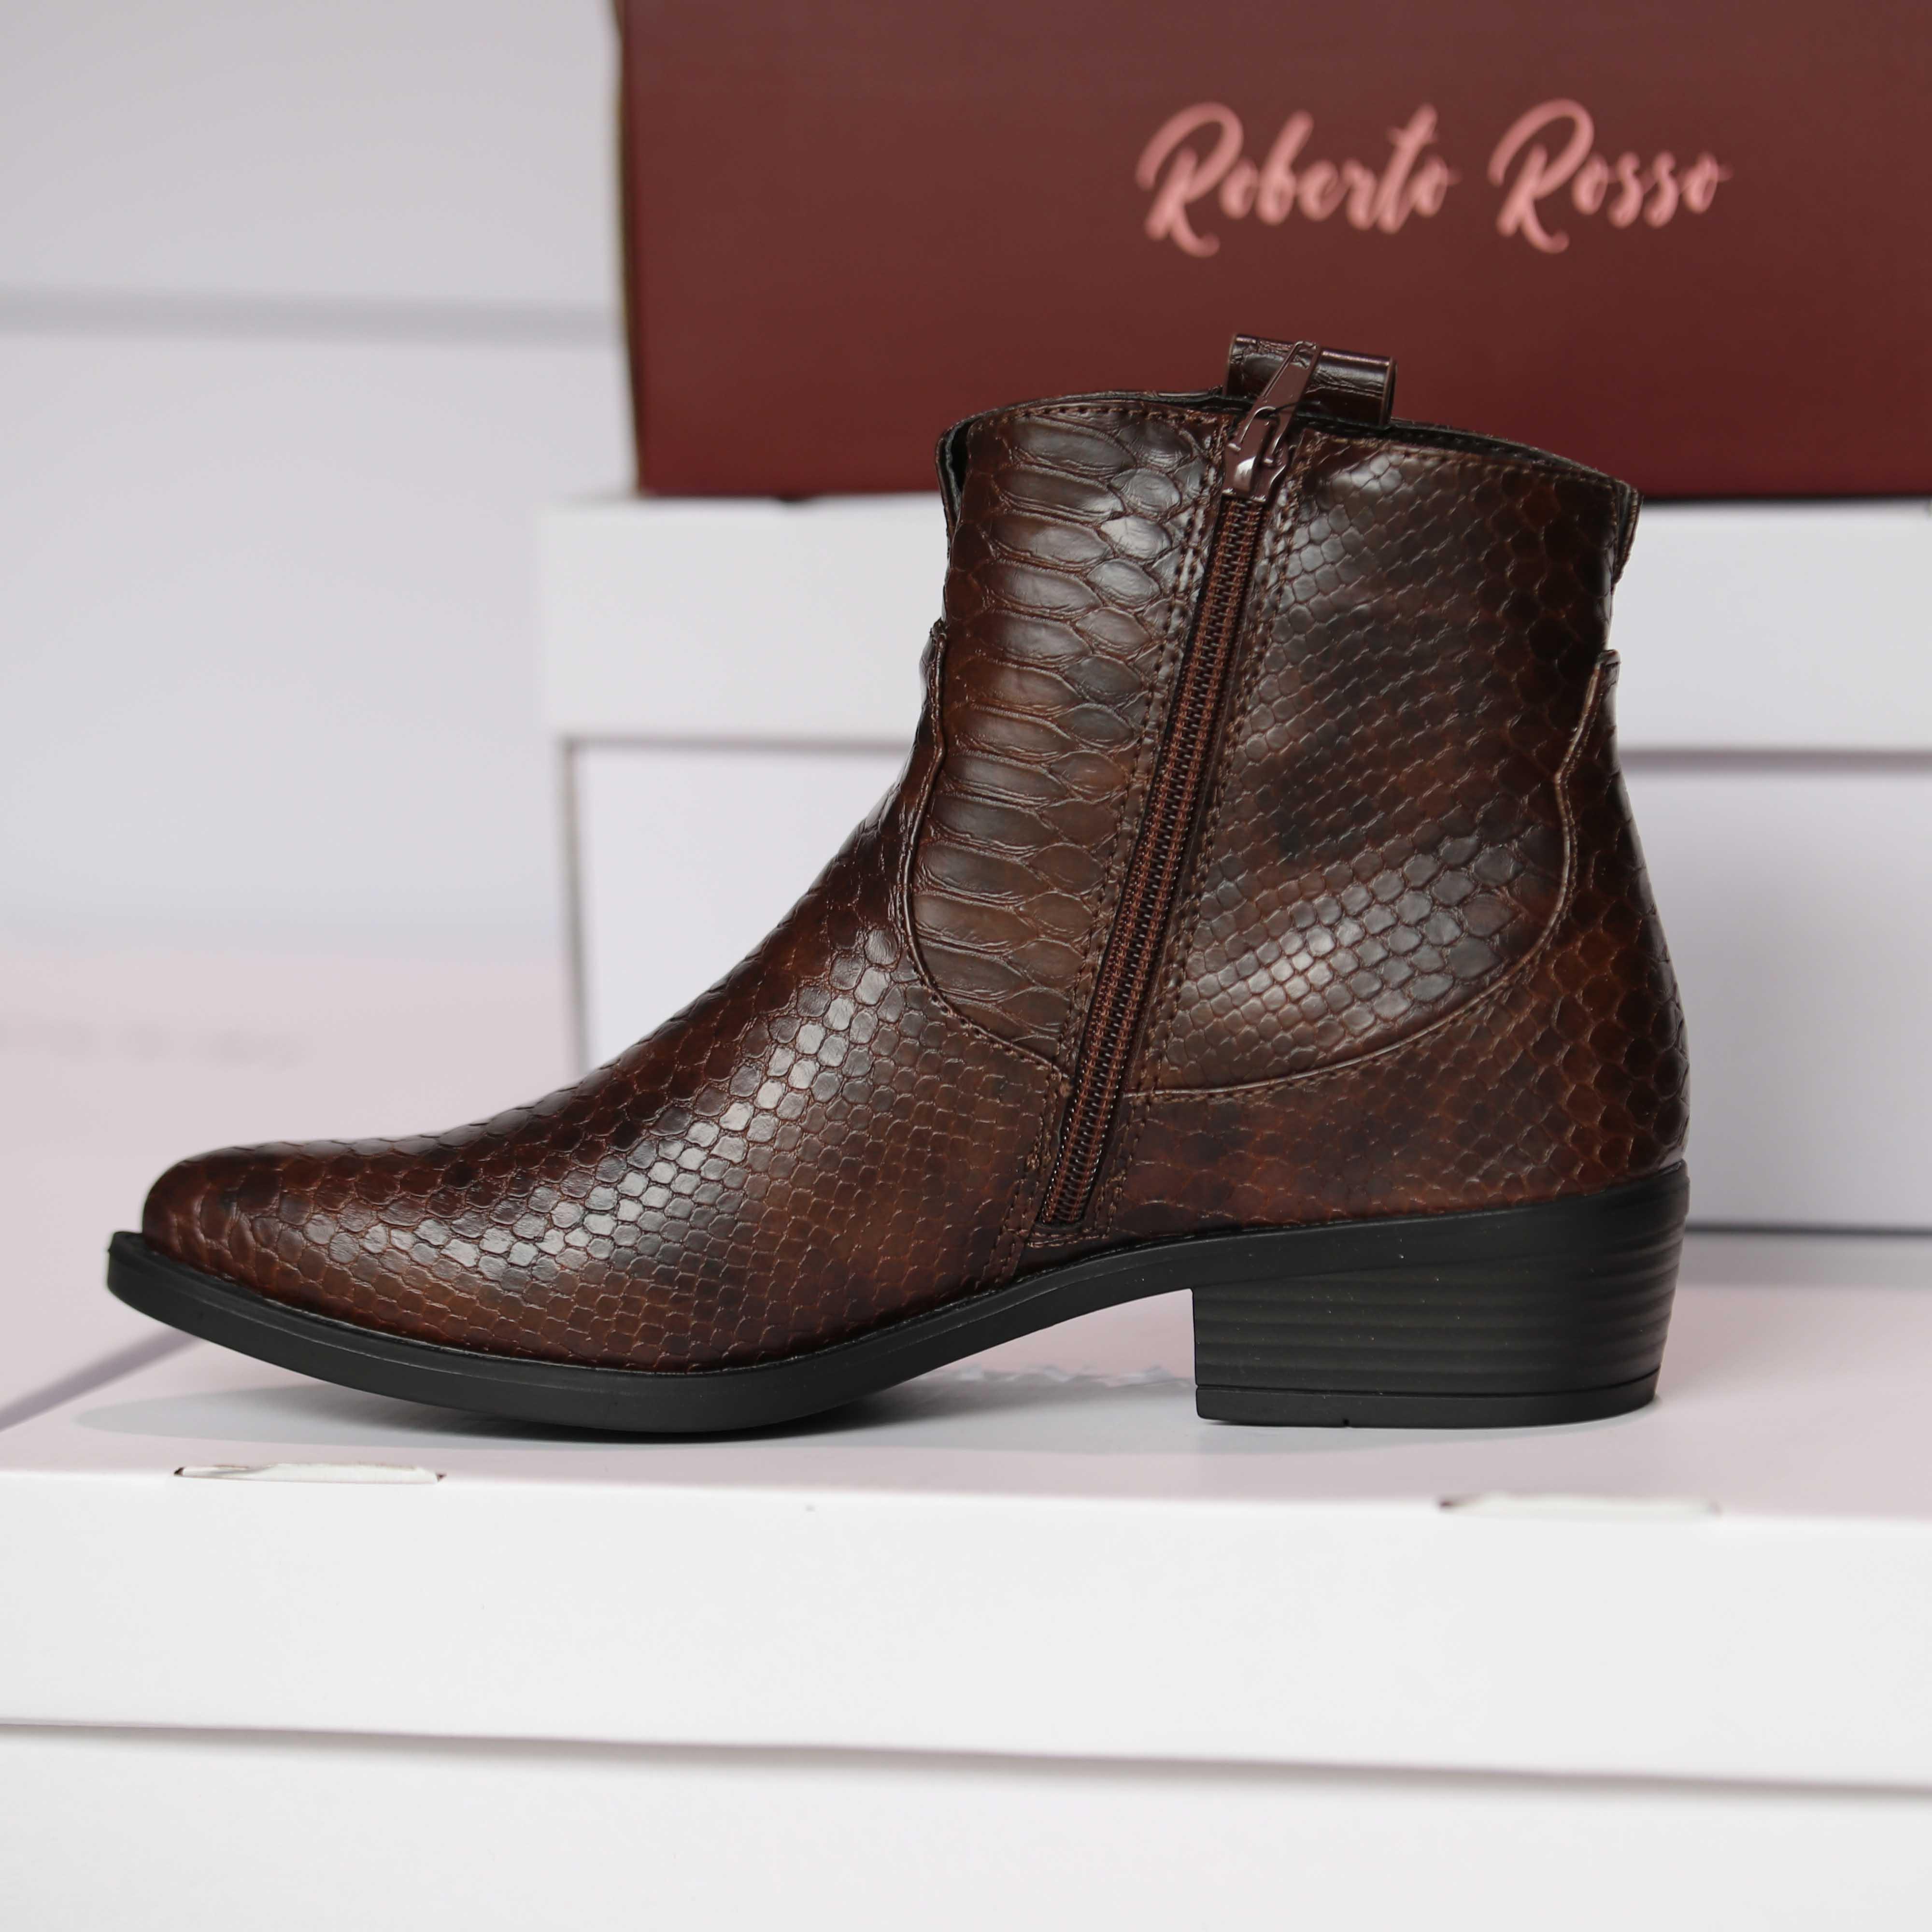 roberto rosso susy brown croco dame sko høst1